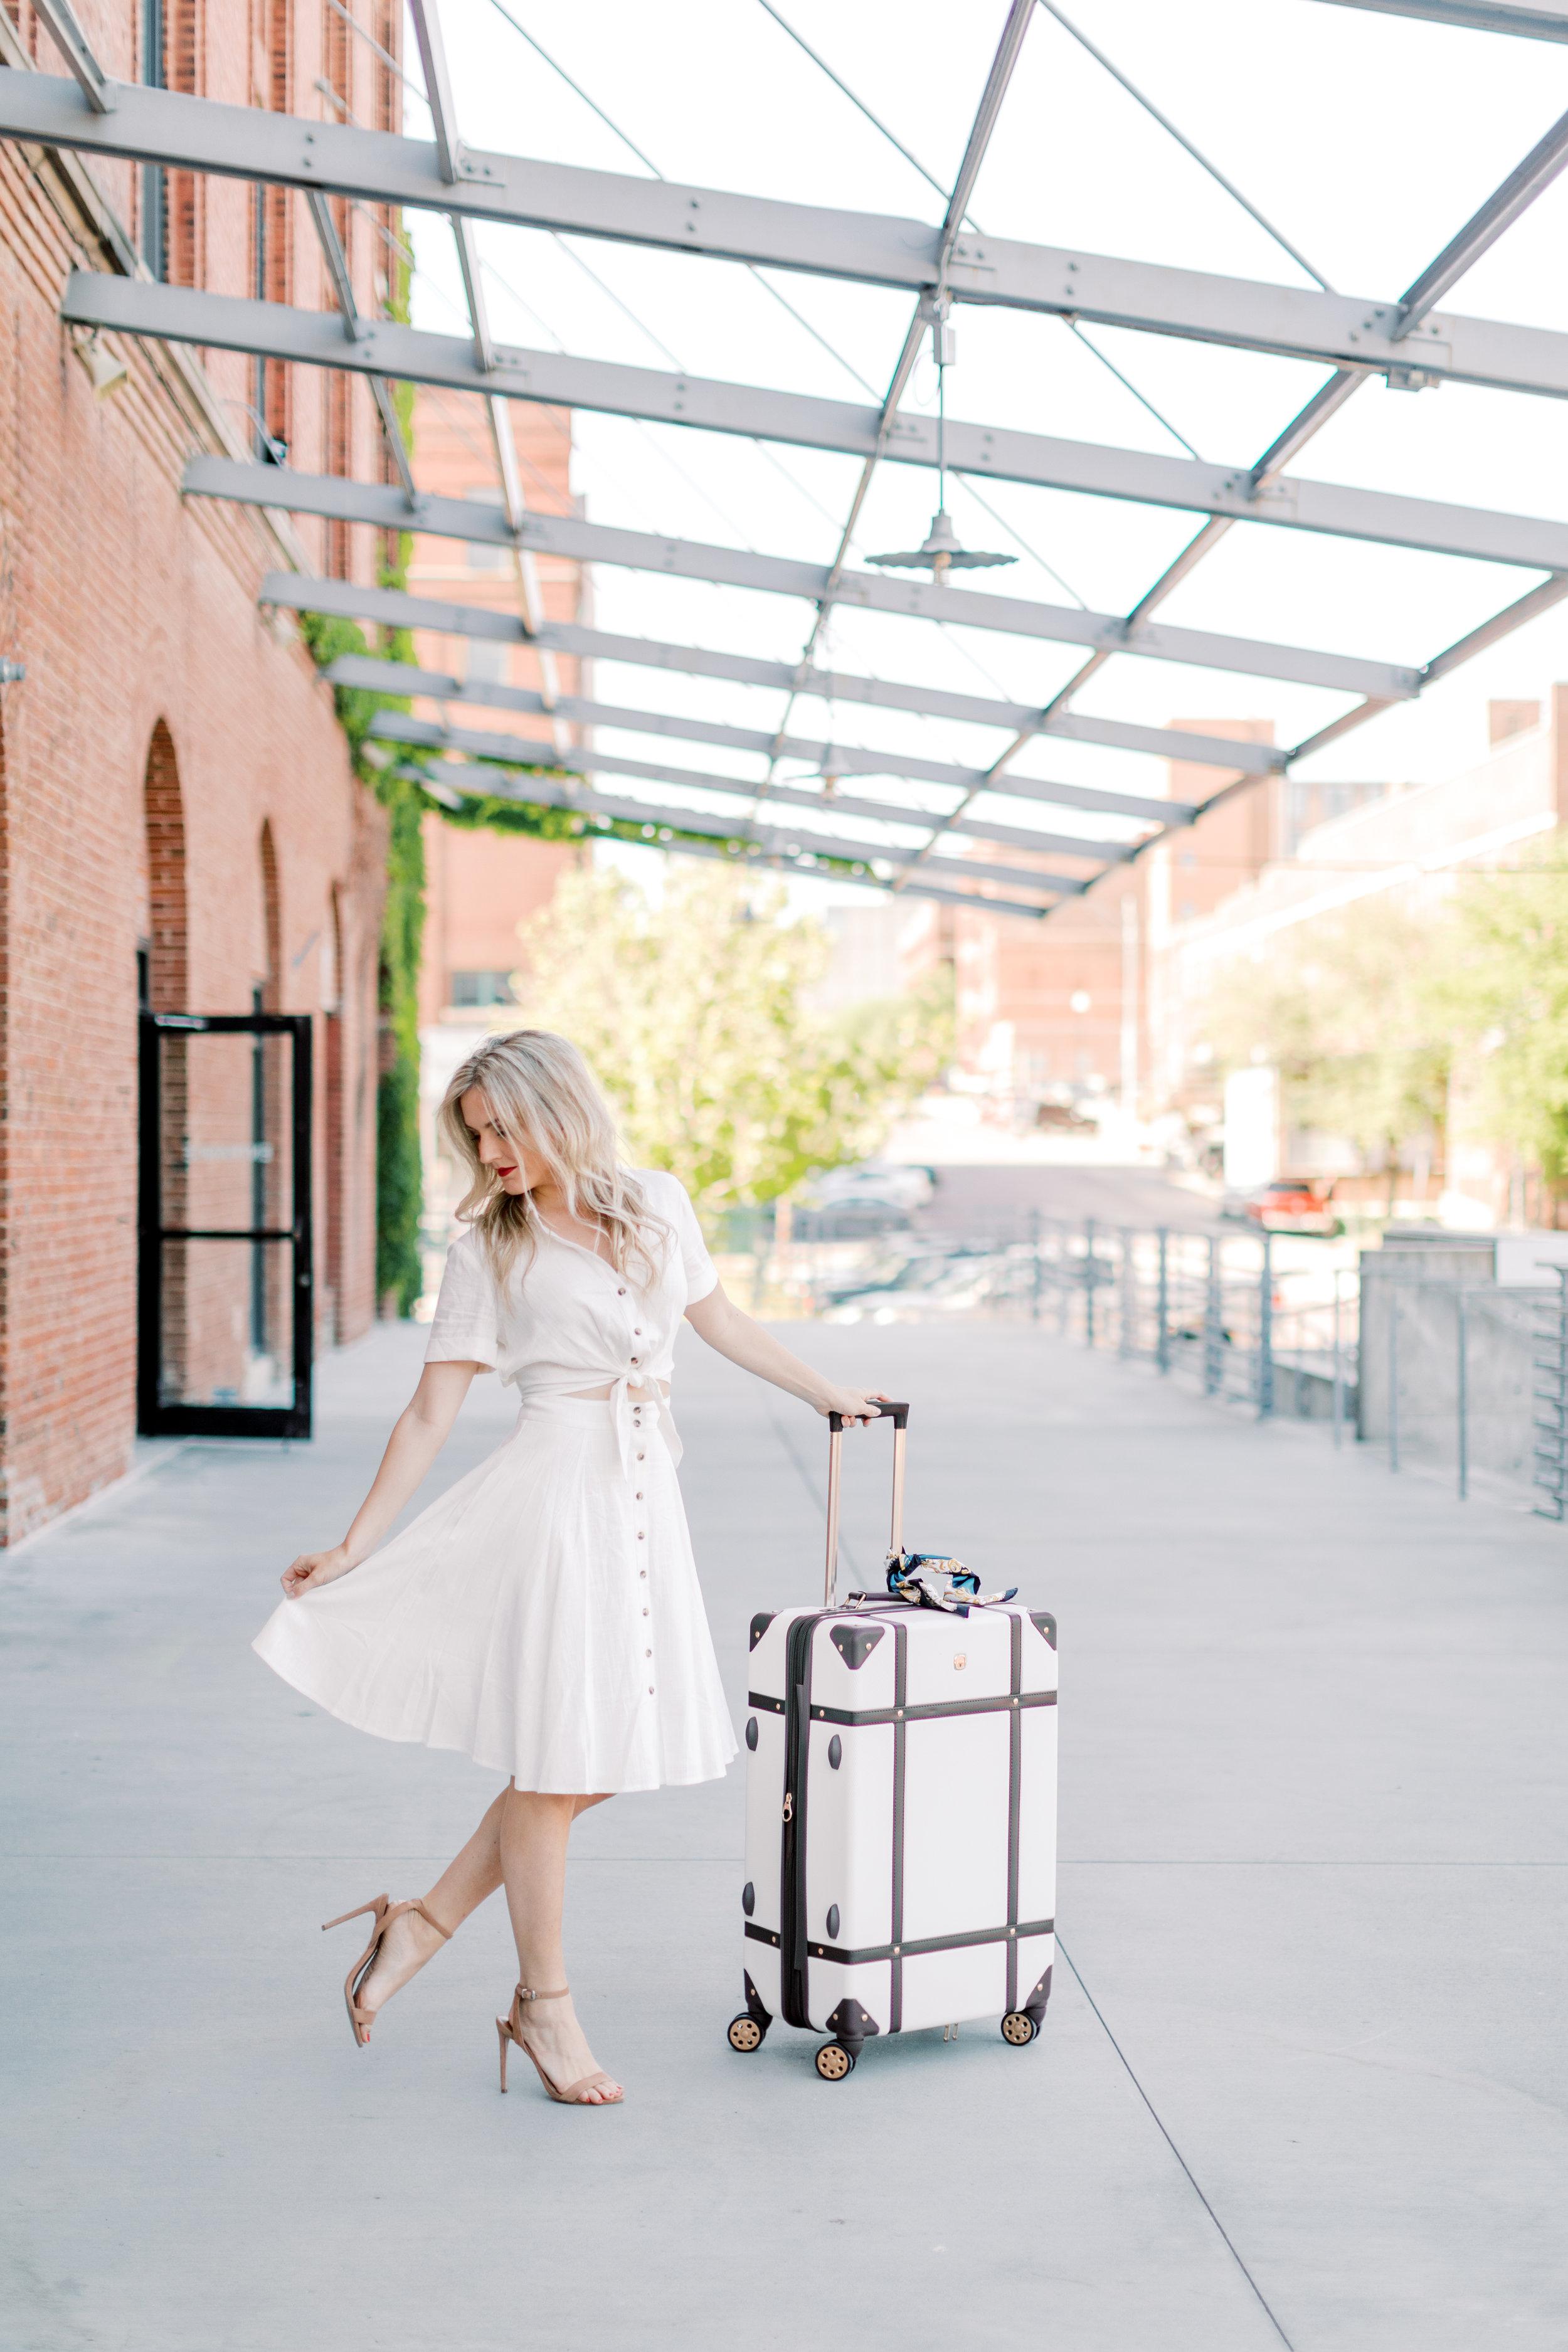 21 - © 2019 Ashley Nicole Photography - Little Bohemia_Omaha_Blogger.jpg